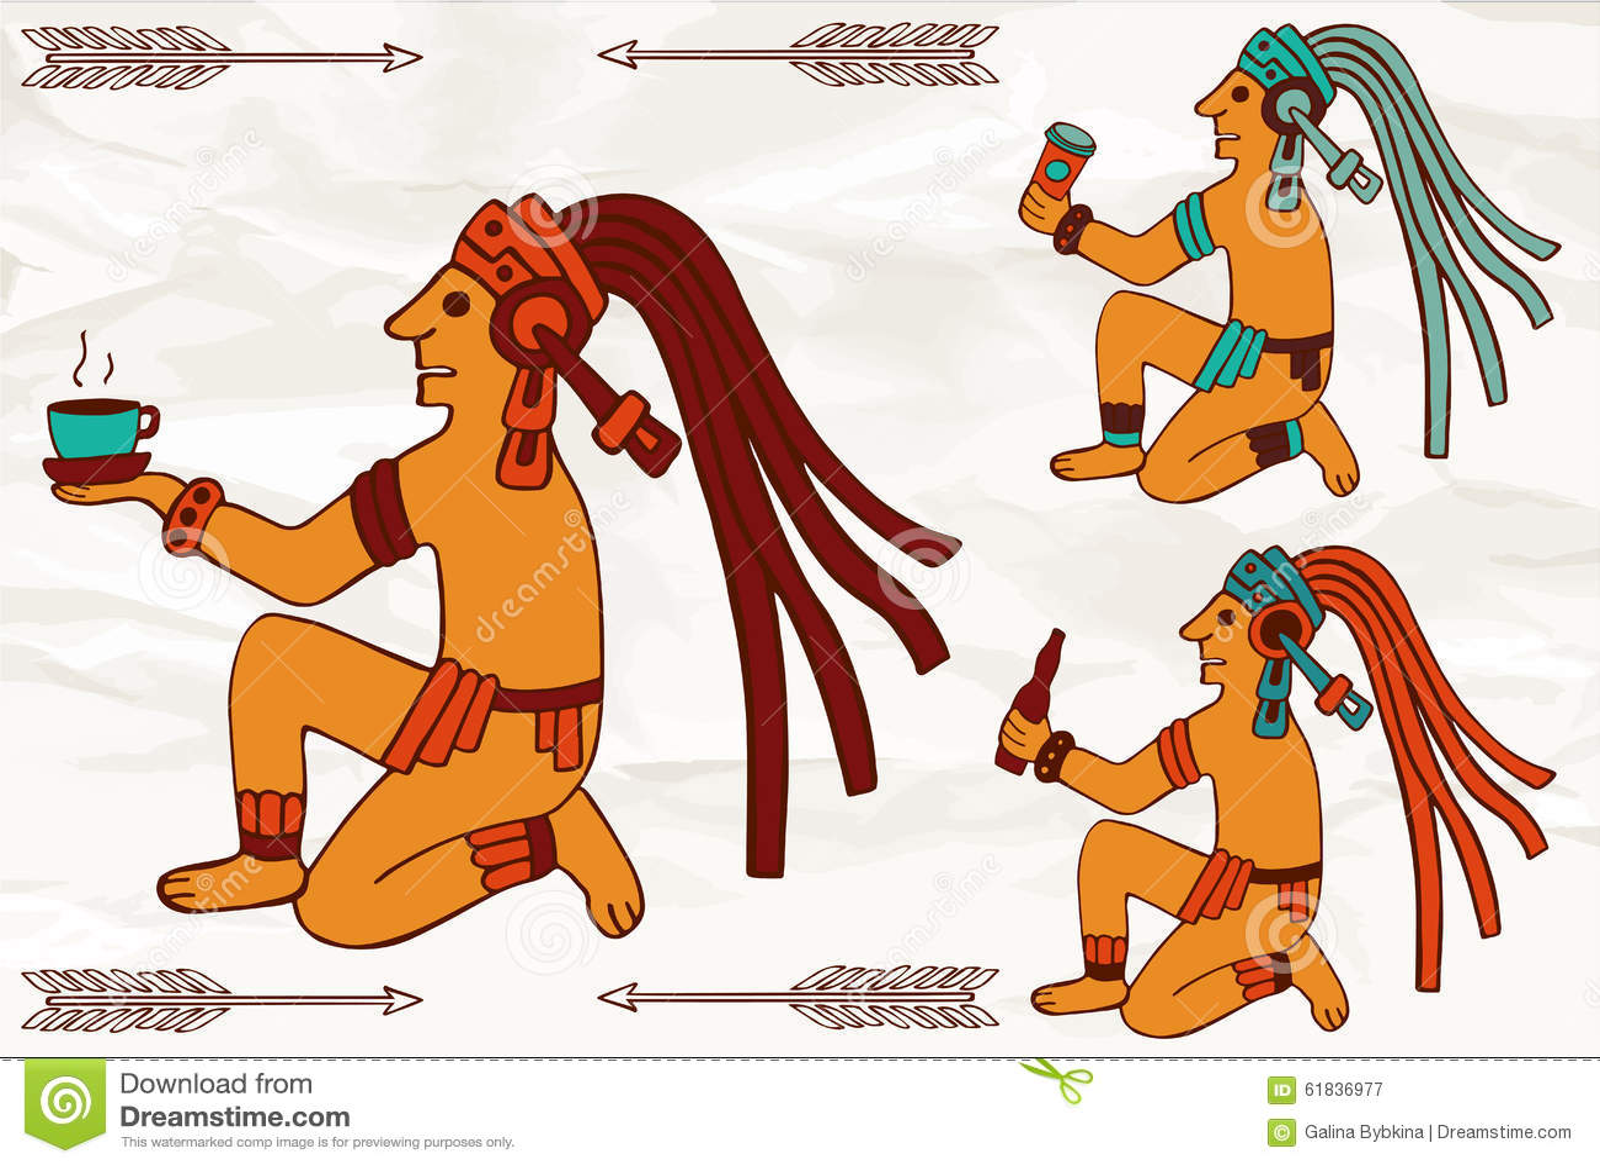 incan indian essays Aztecs maya inca aztec, maya, inca comparison chart aztec maya inca location.